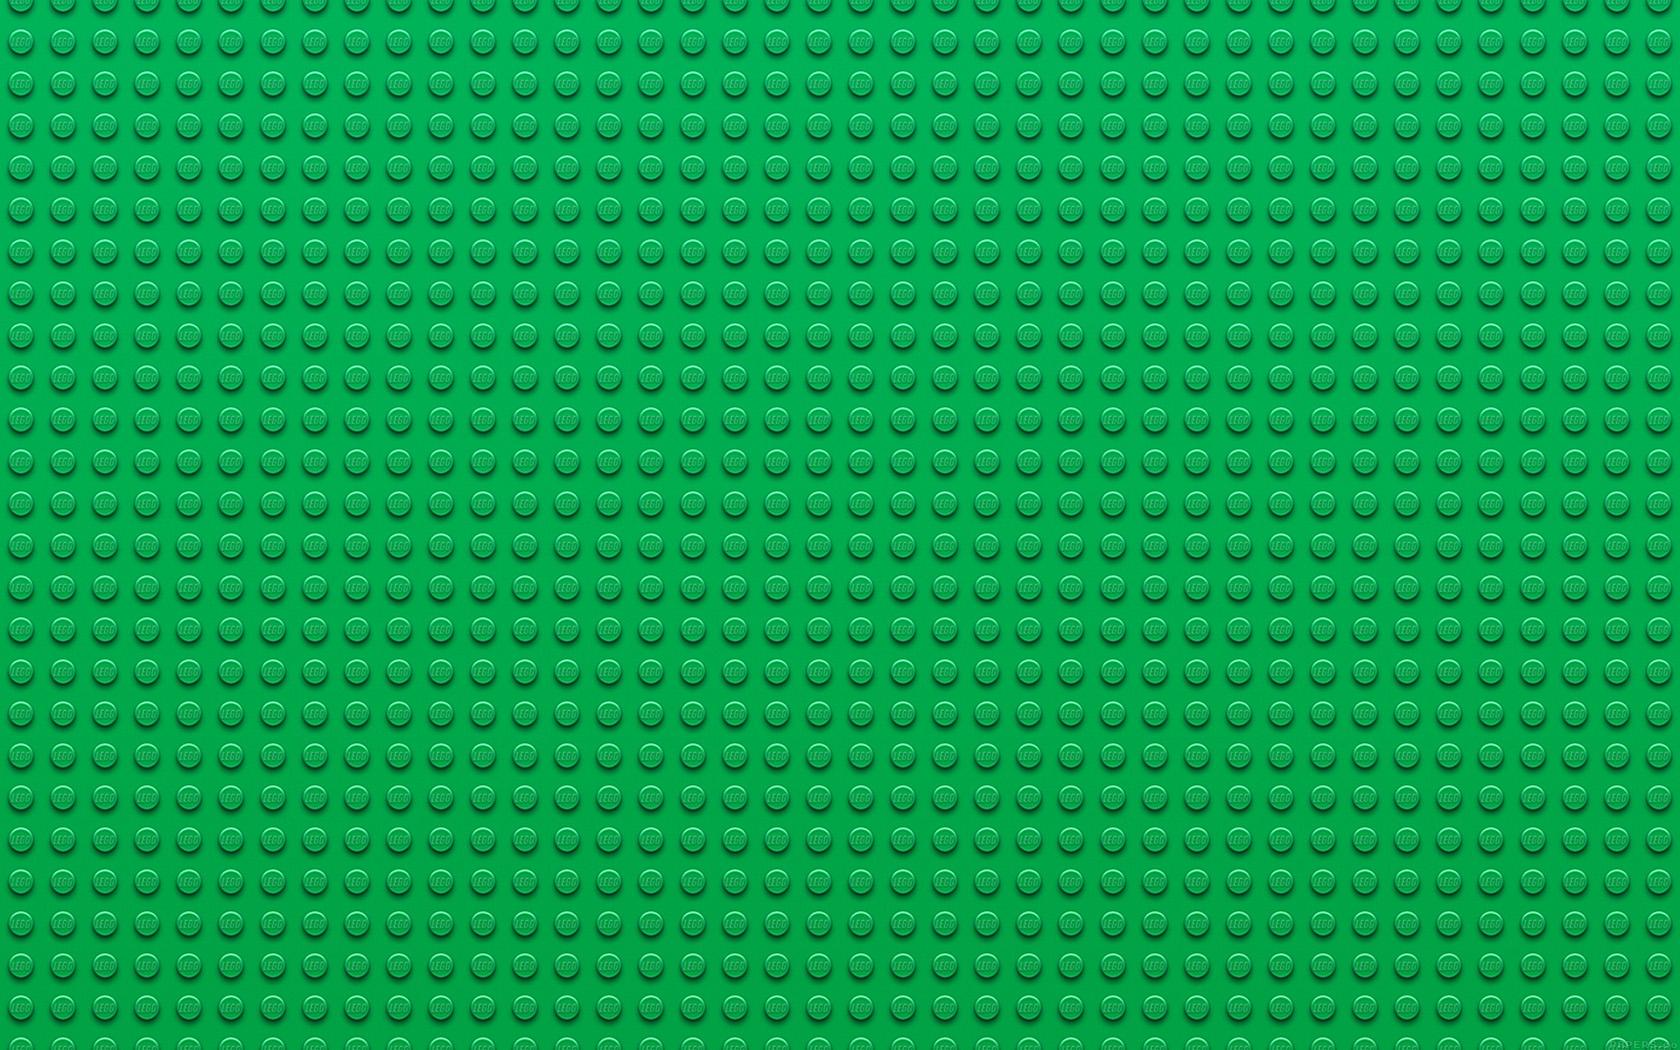 Vf30 Lego Toy Green Block Pattern